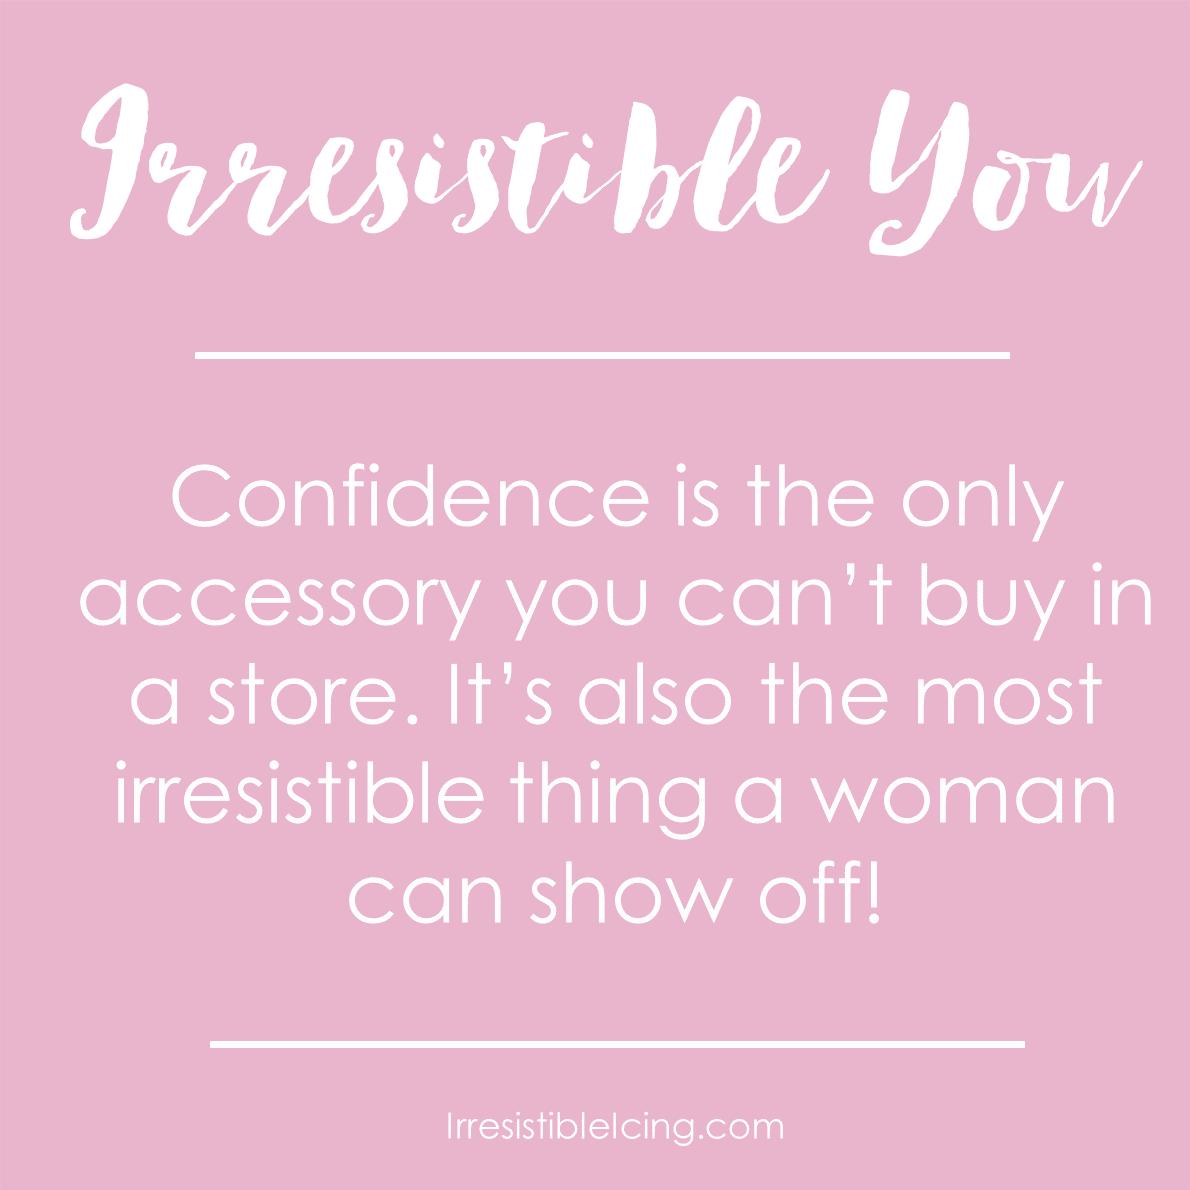 Irresistible You Tip 1